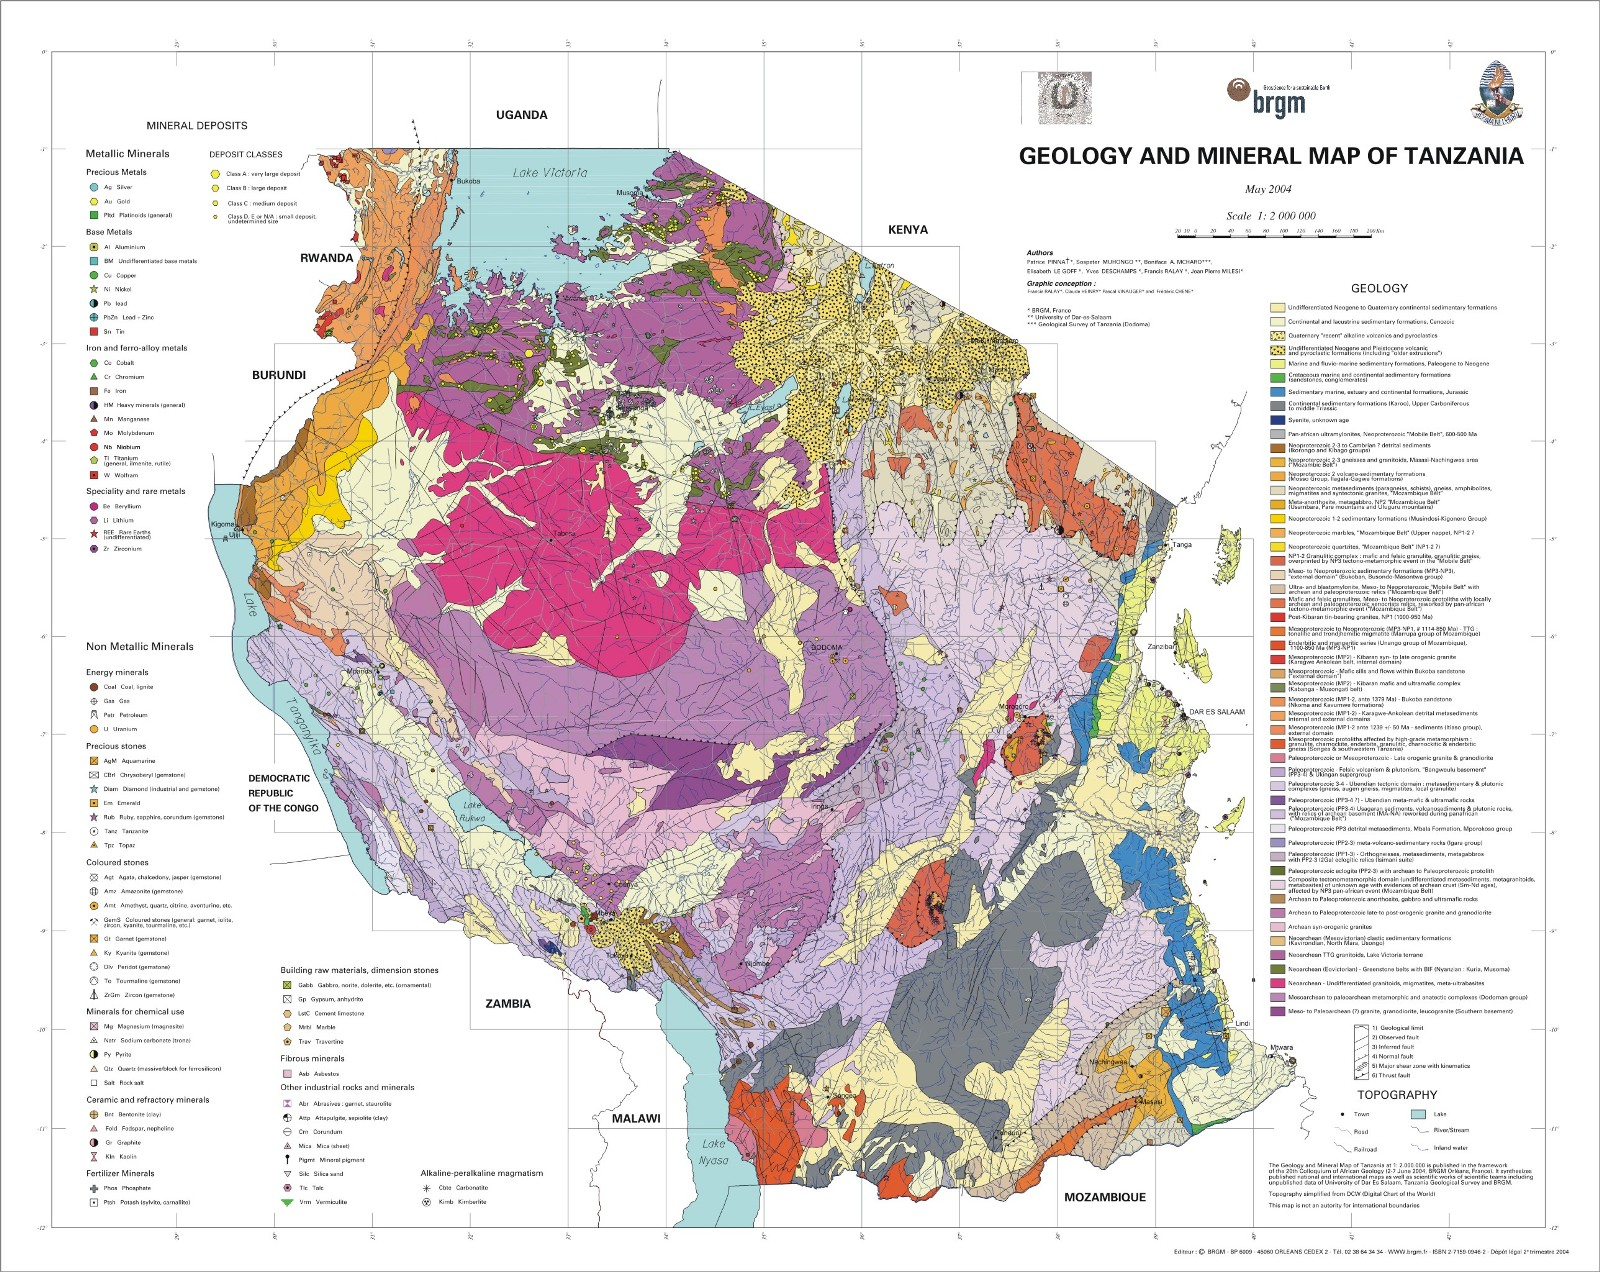 Geological Maps Earth Sciences Institute Of Shinyanga ESIS - Map of tanzania